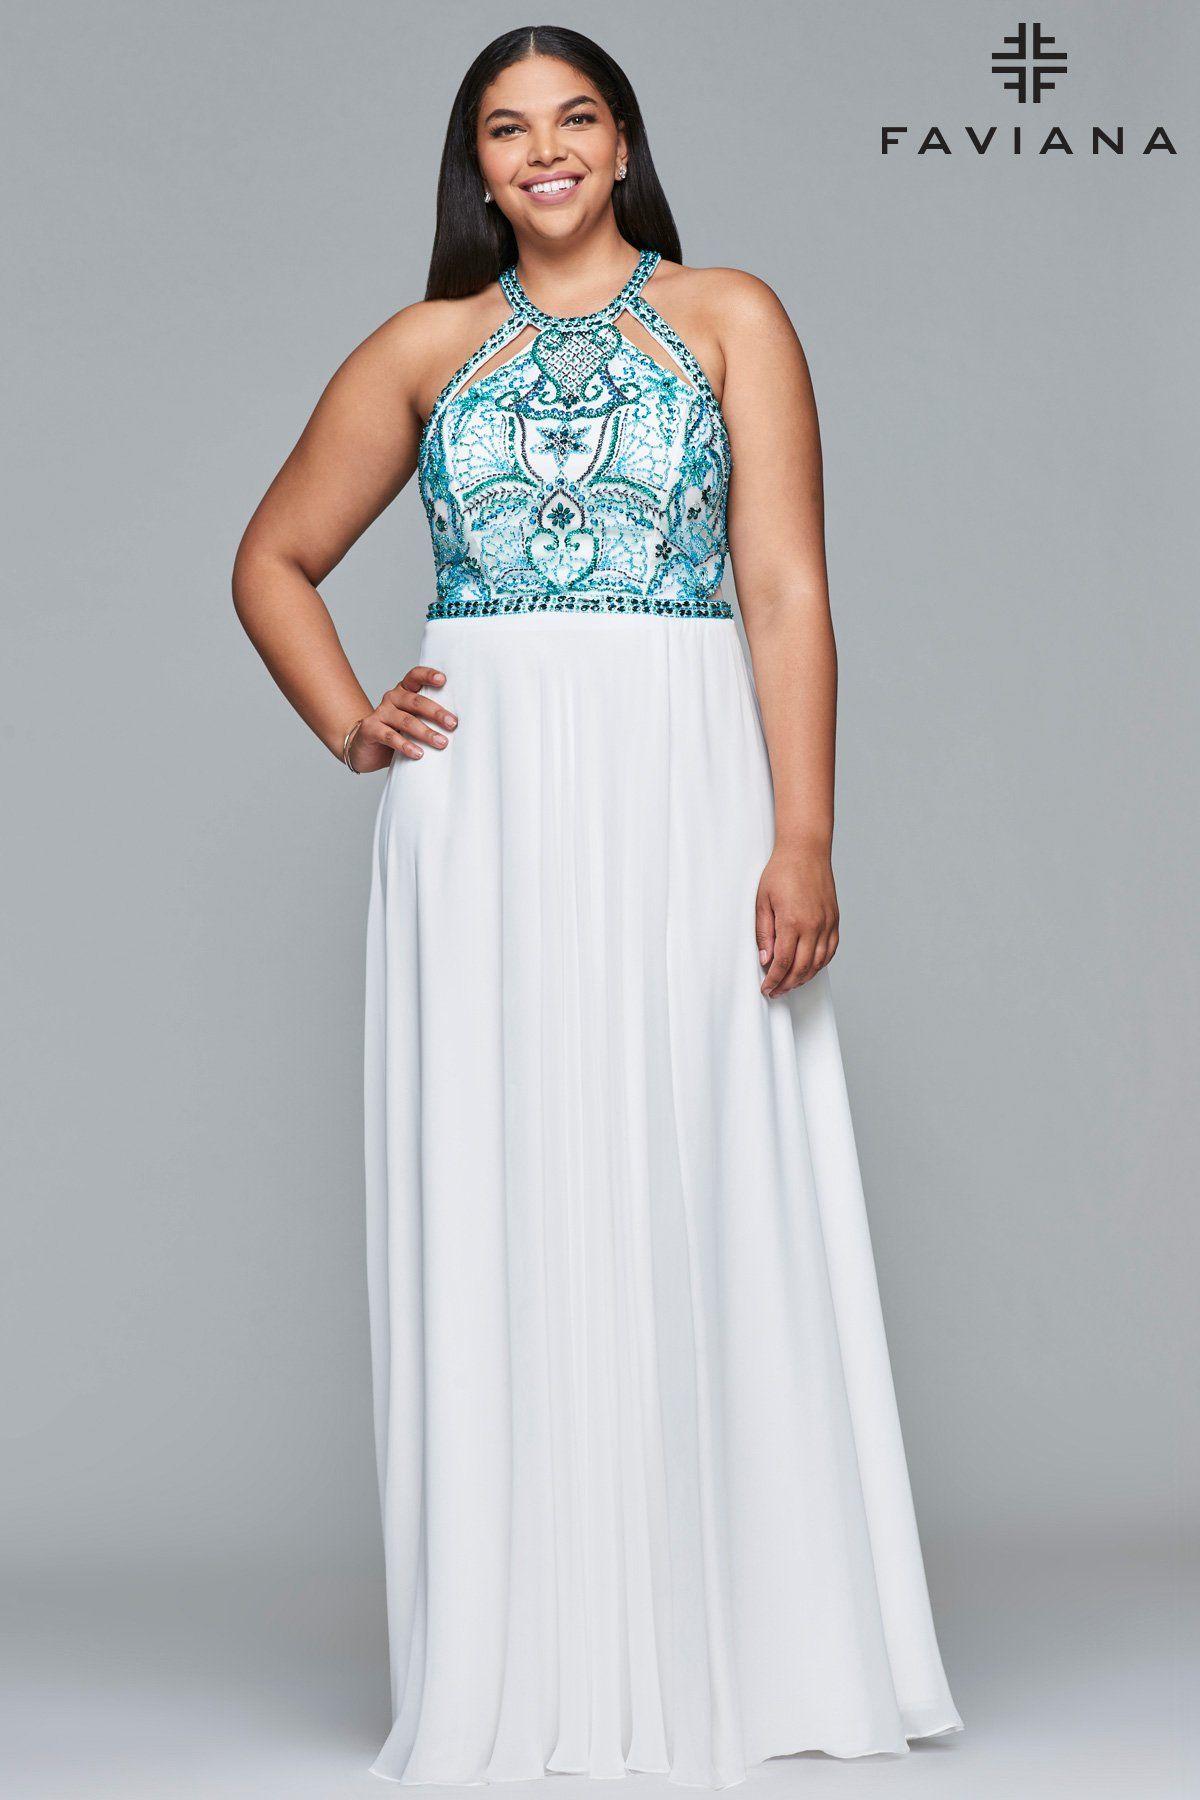 7d19aa0097c Faviana 9434  prom  prom2k18  promnight  juniorprom  seniorprom  promselfie   promtoday  faviana  promball  promlooks  promfashion  gowns  couturedress  ...